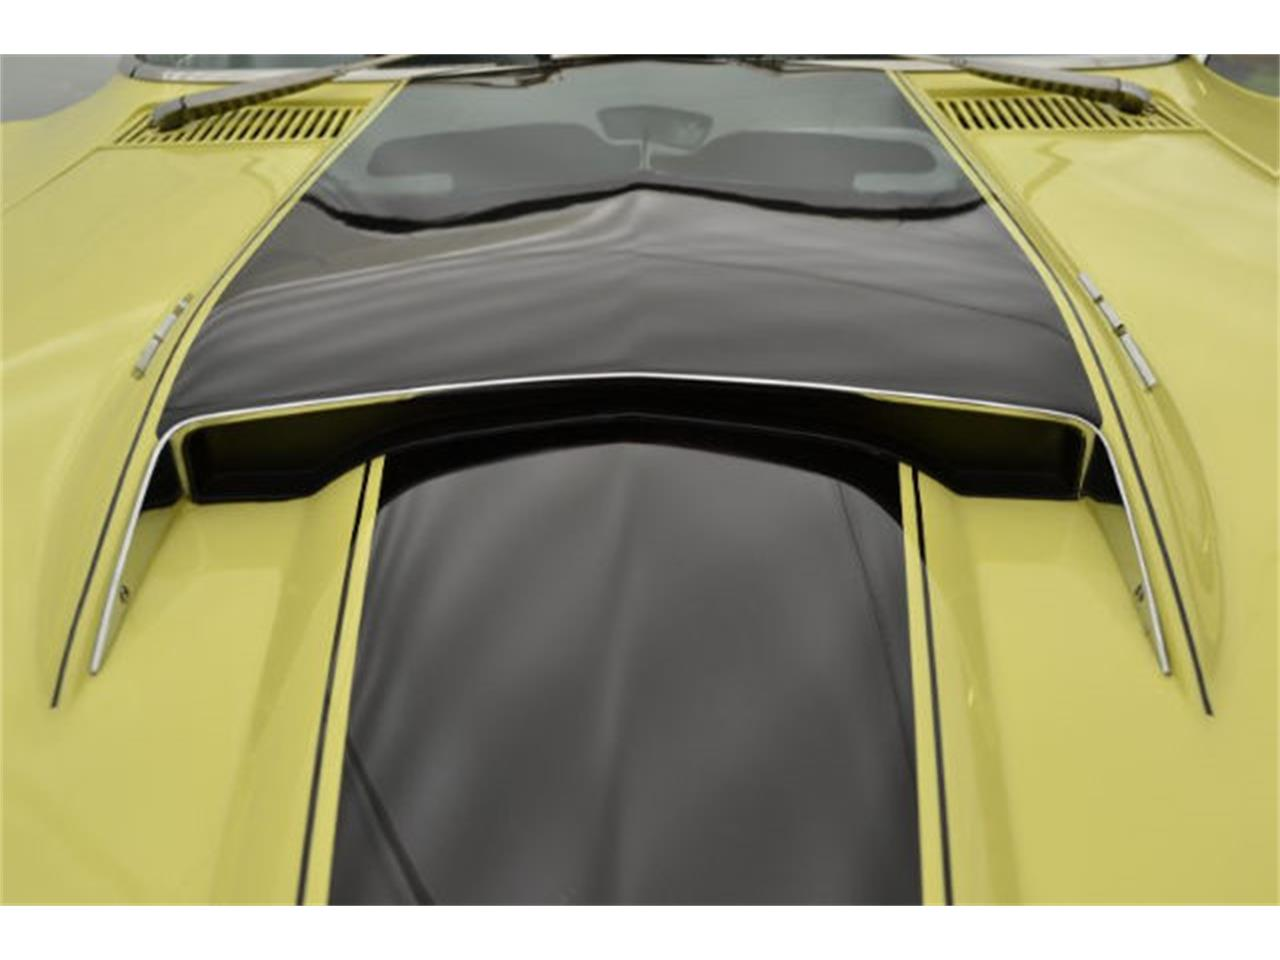 Large Picture of Classic 1967 Corvette located in North Carolina - $139,995.00 - 8QFH